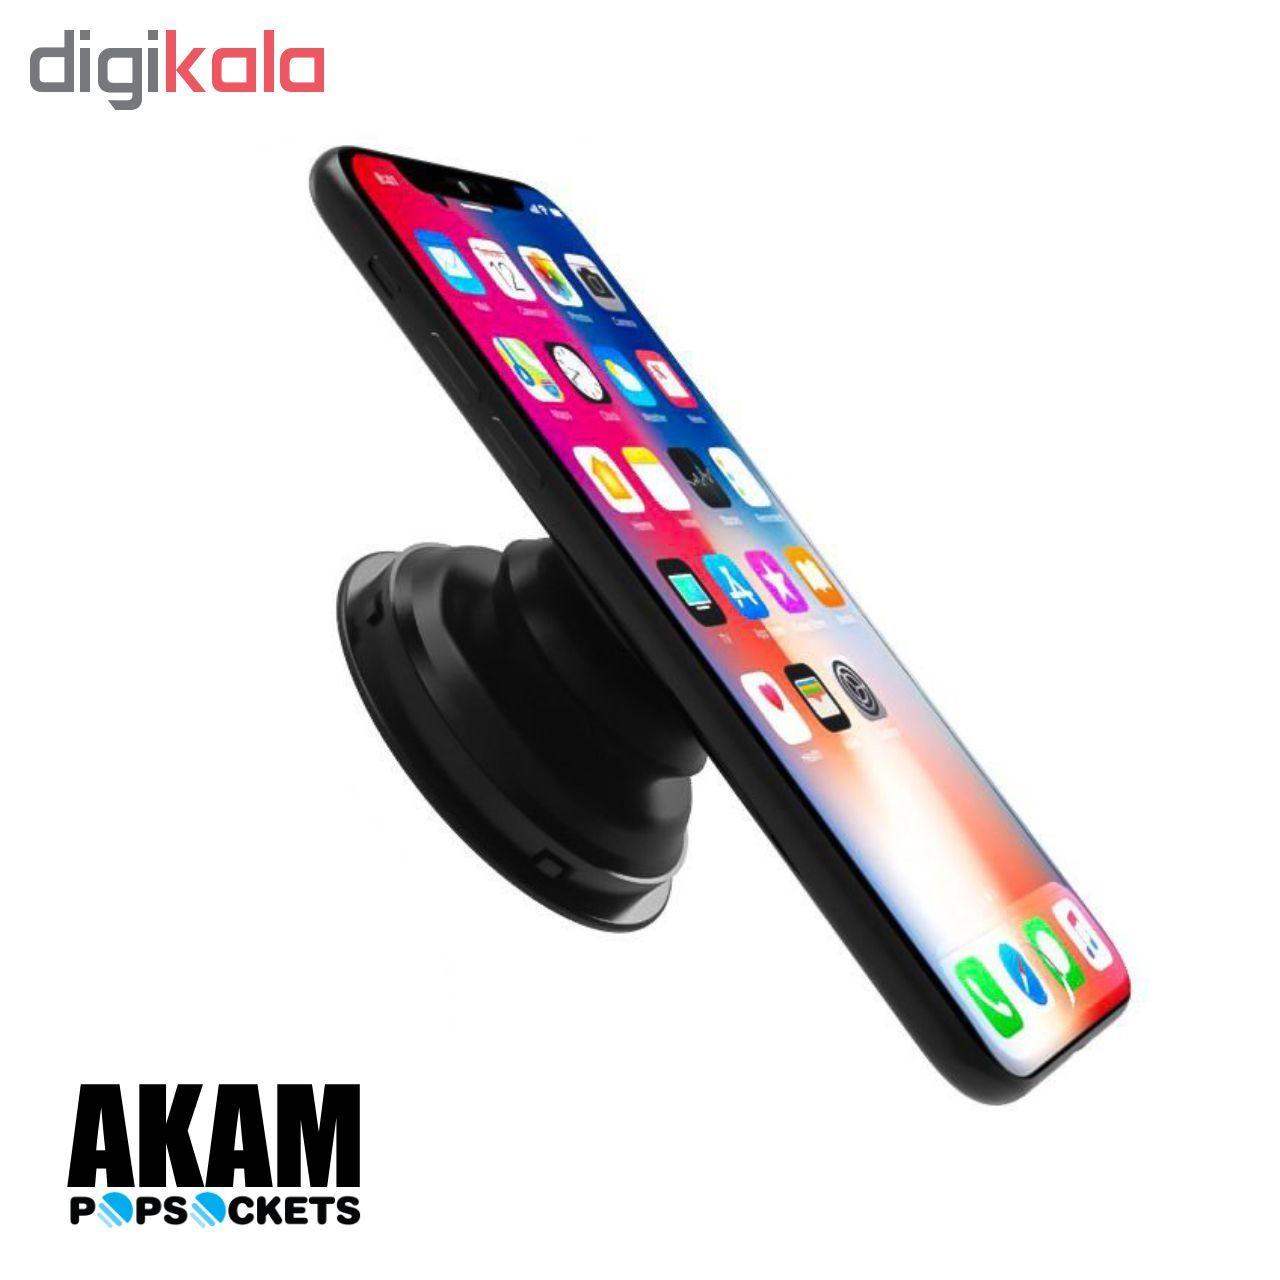 پایه نگهدارنده گوشی موبایل پاپ سوکت آکام مدل APS0061 main 1 7